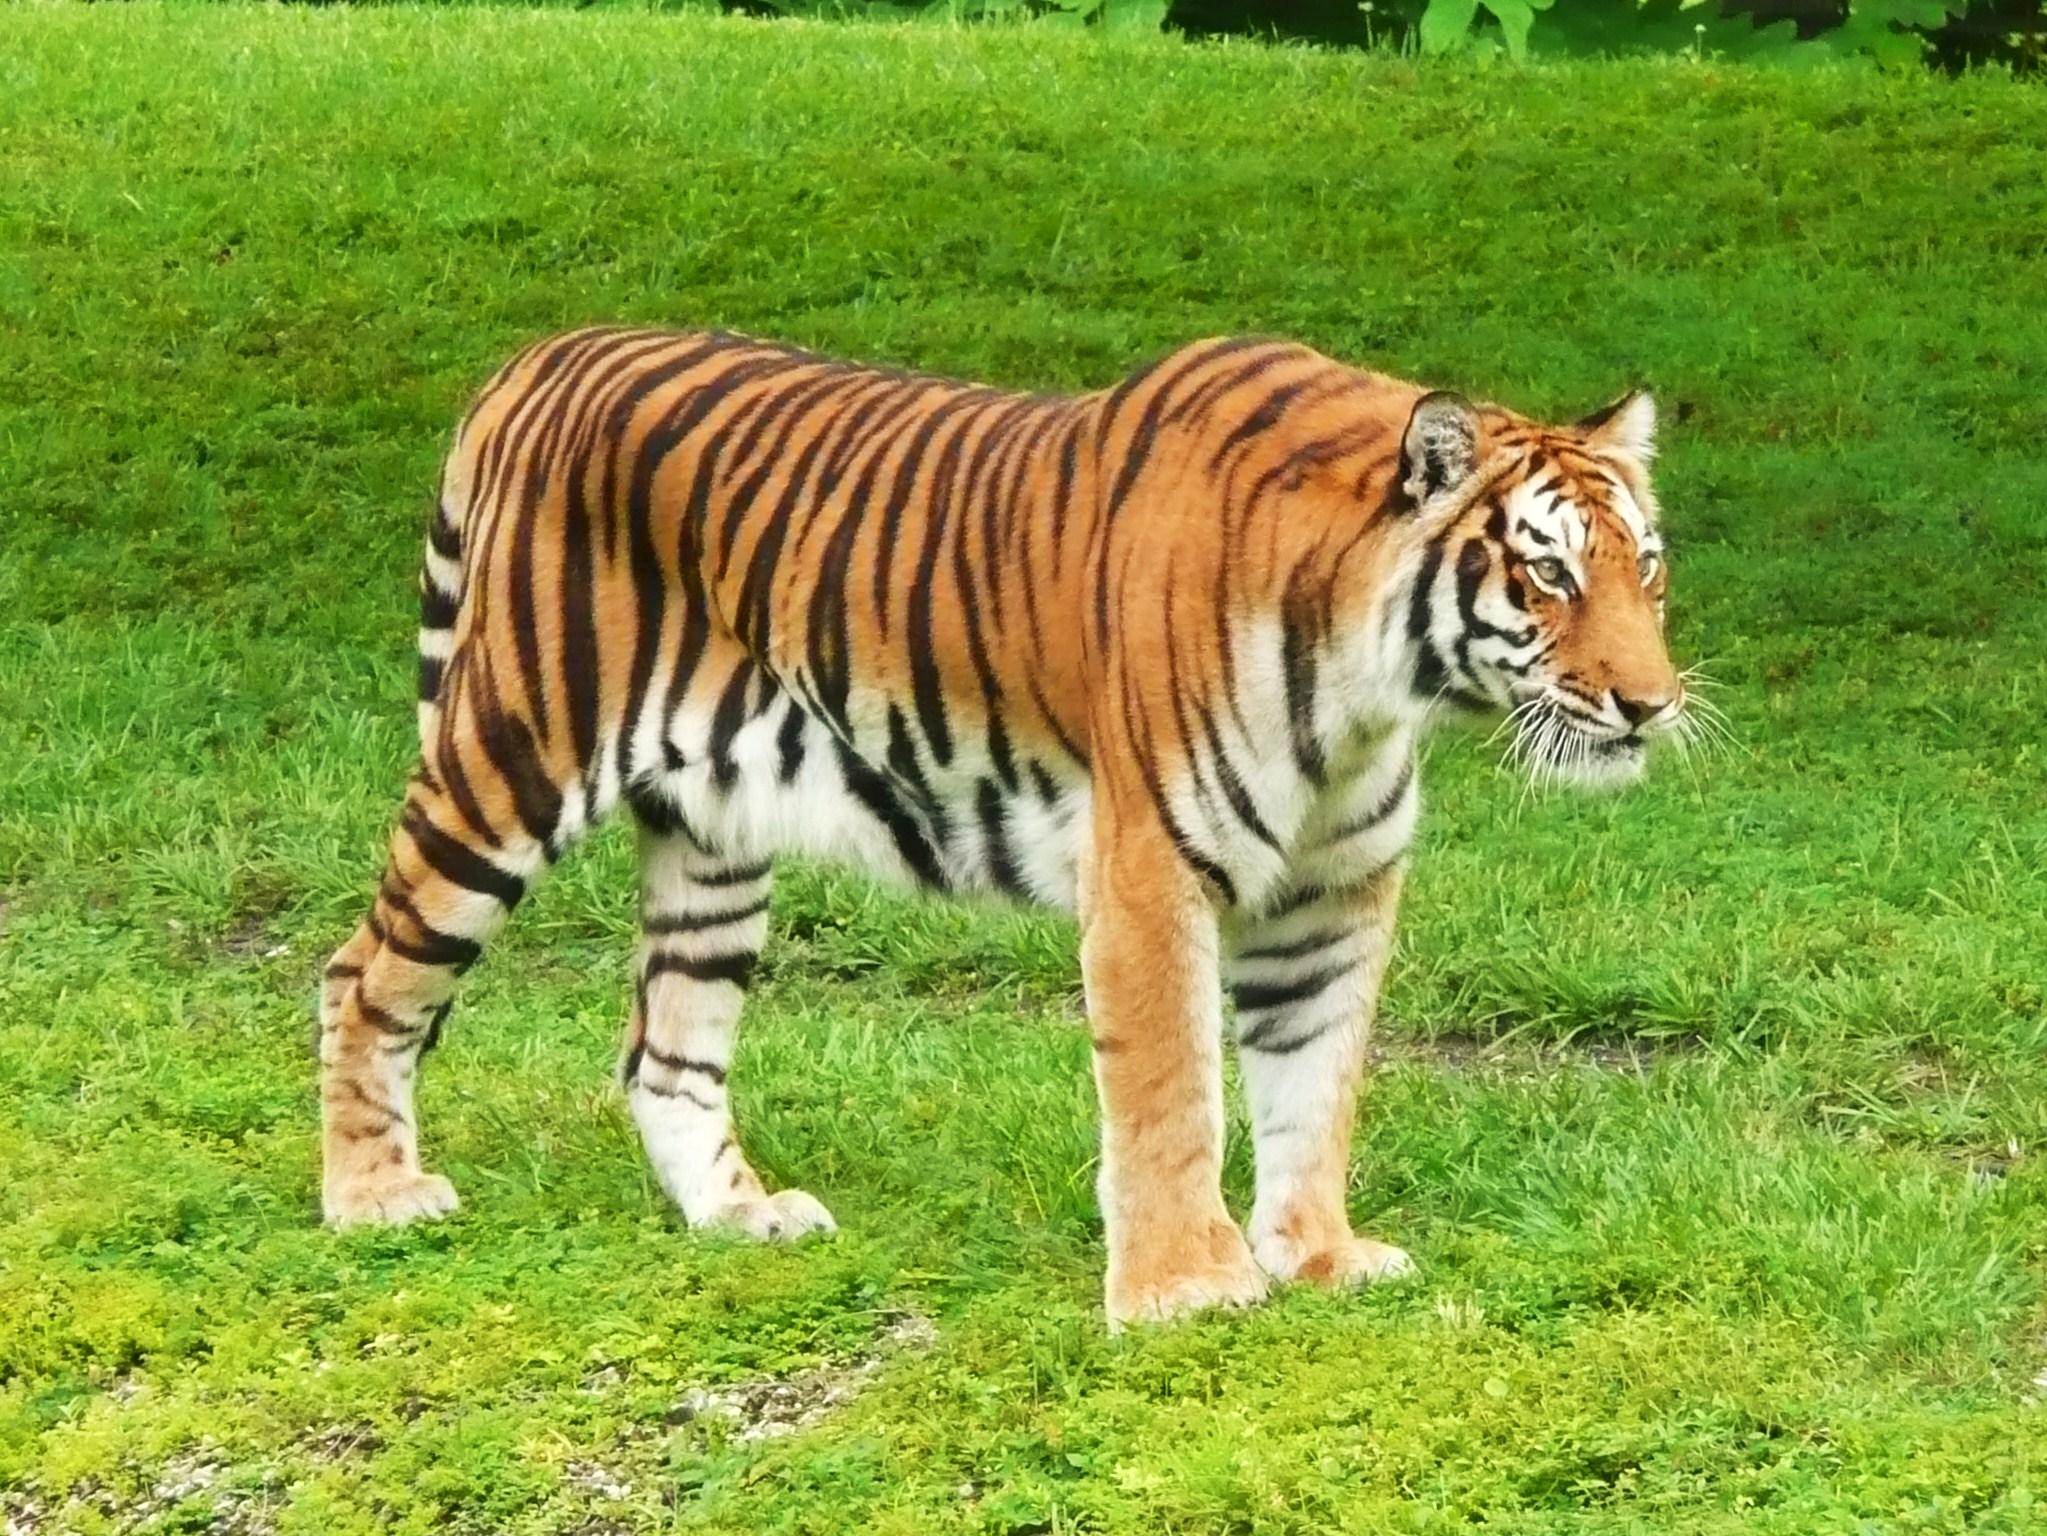 File:Bengal Tiger Miami MetroZoo.jpg - Wikimedia Commons